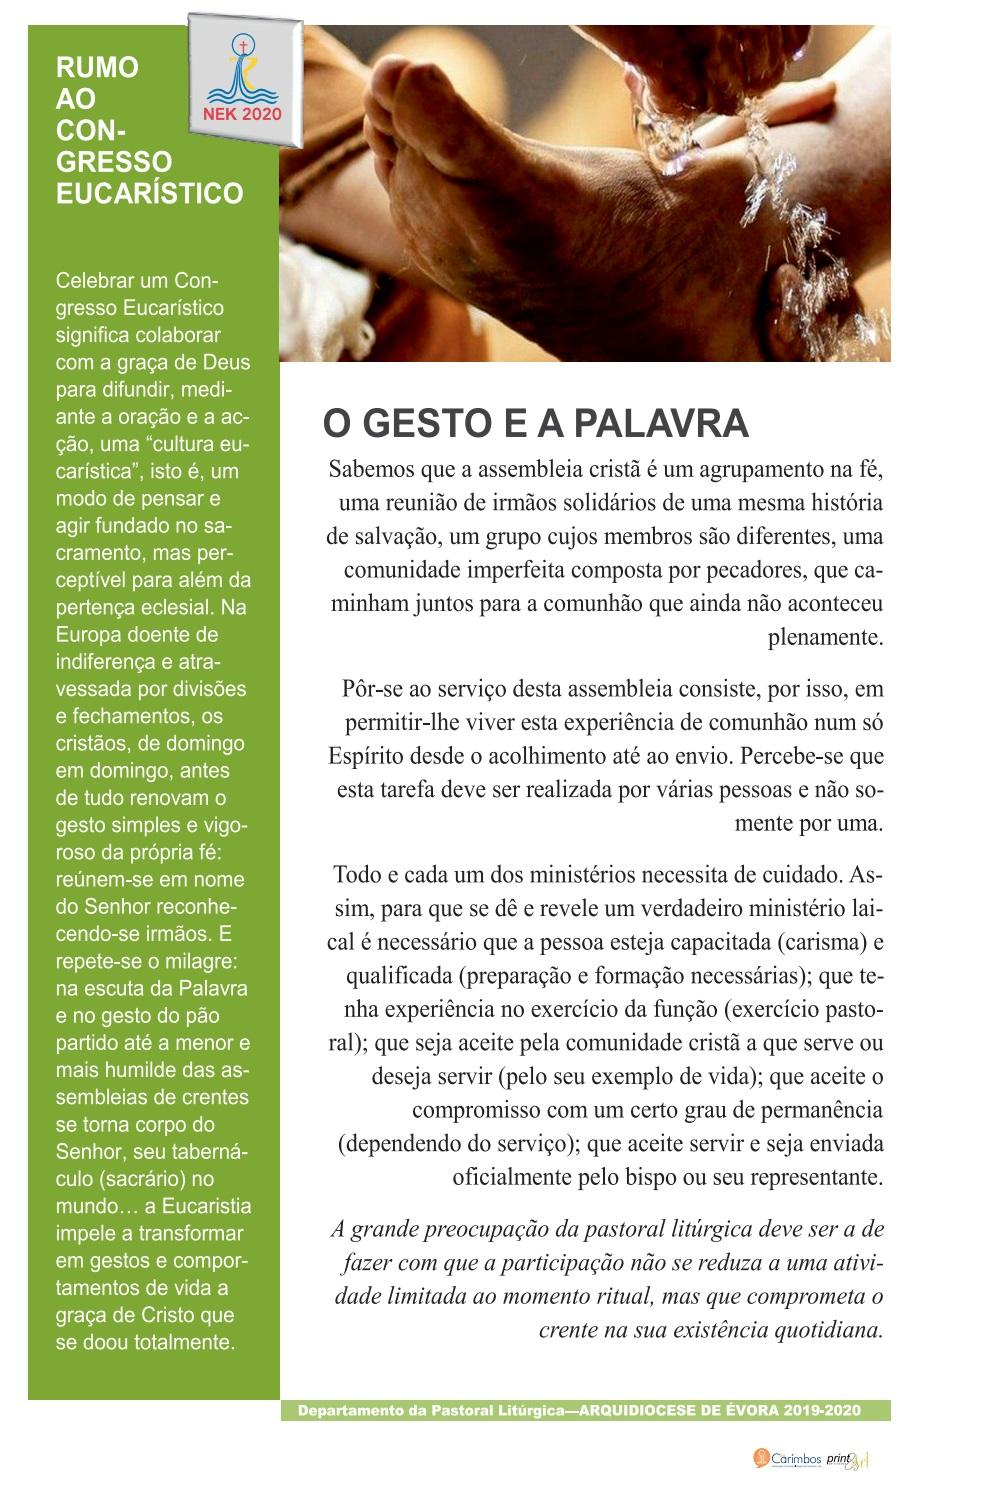 02_02_2020_FICHA 3 - Eucaristia 2 FEV202 - festa da apresentacao_2